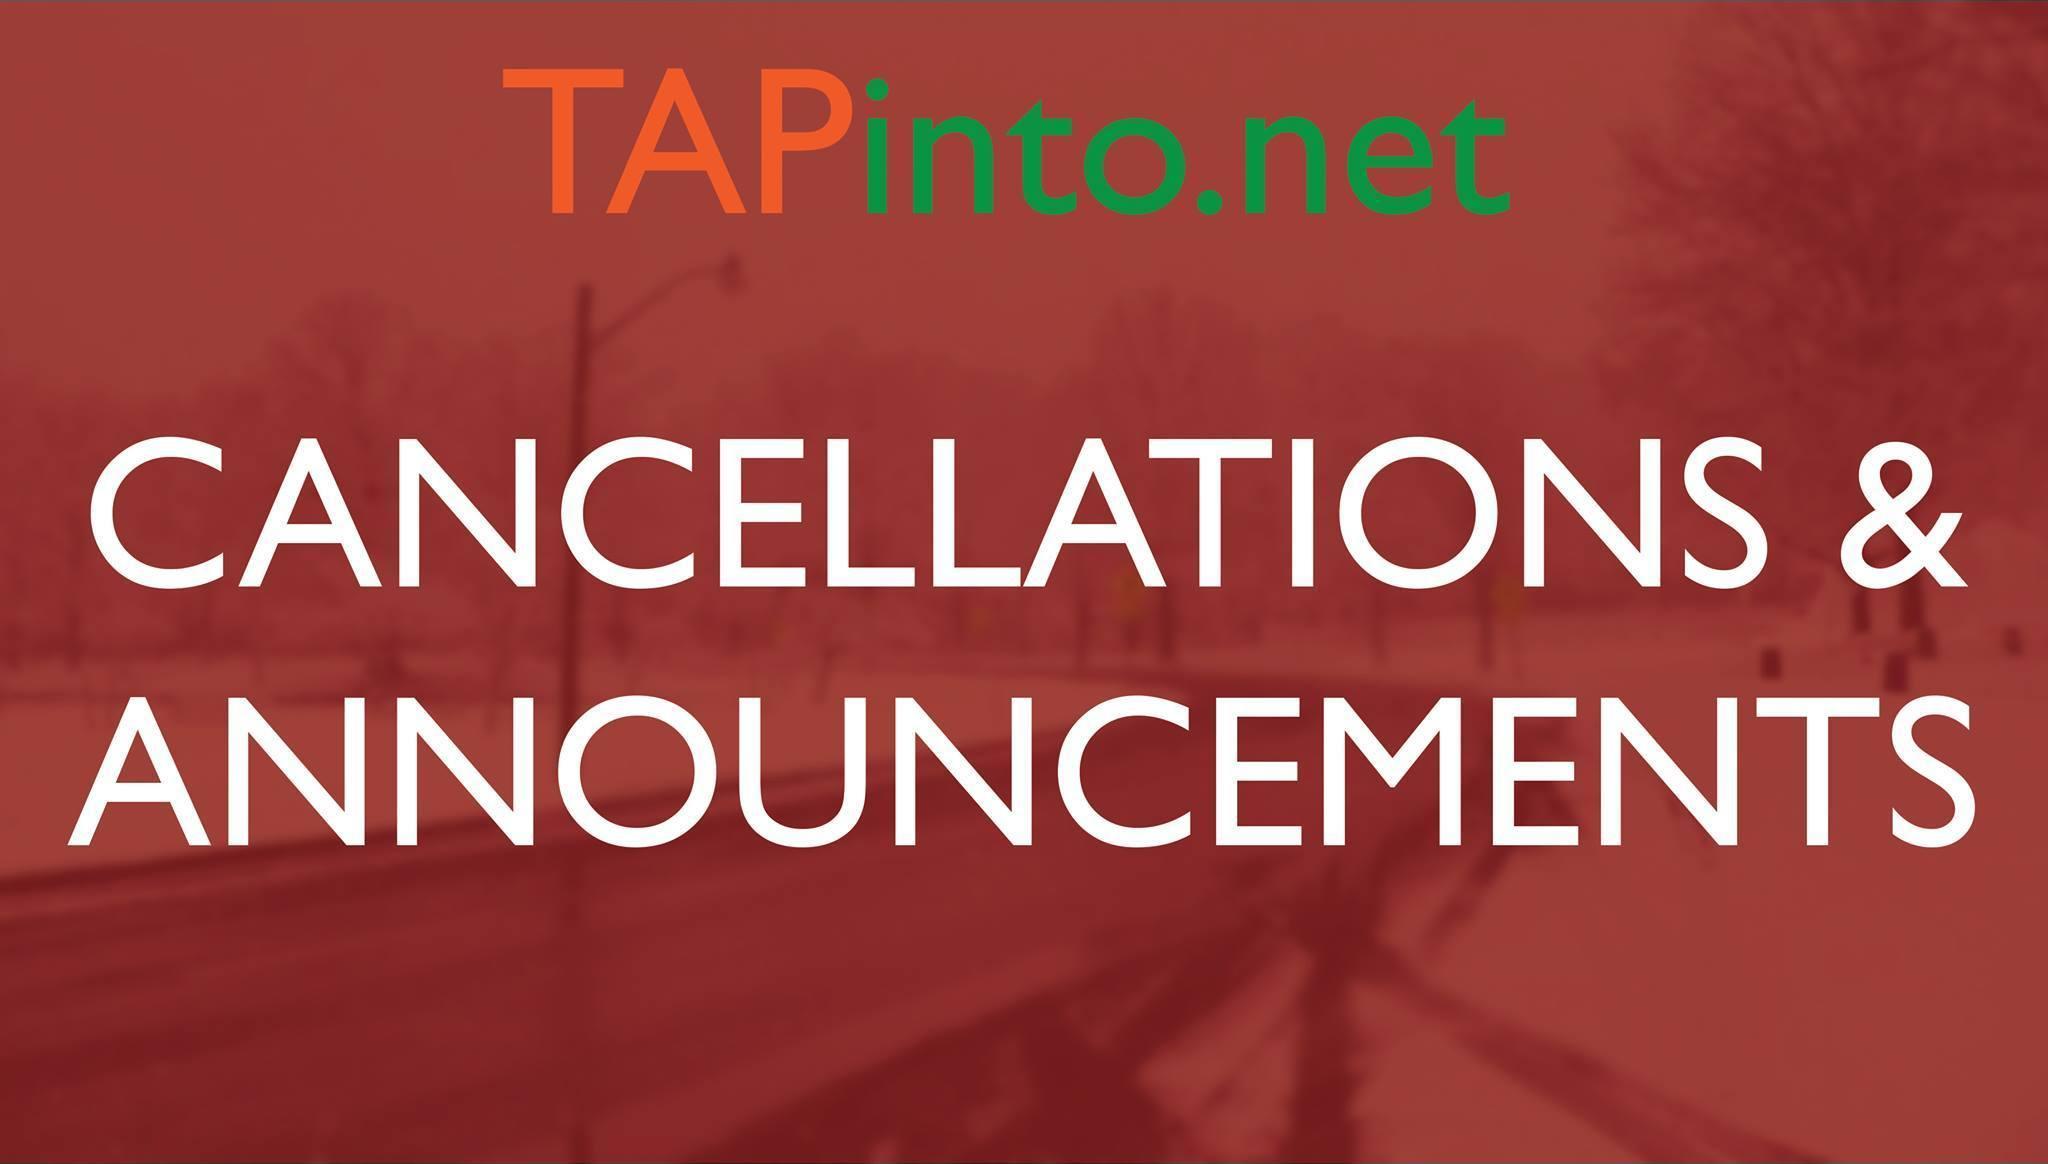 c4ca8e68806795a22896_cancellations.jpg